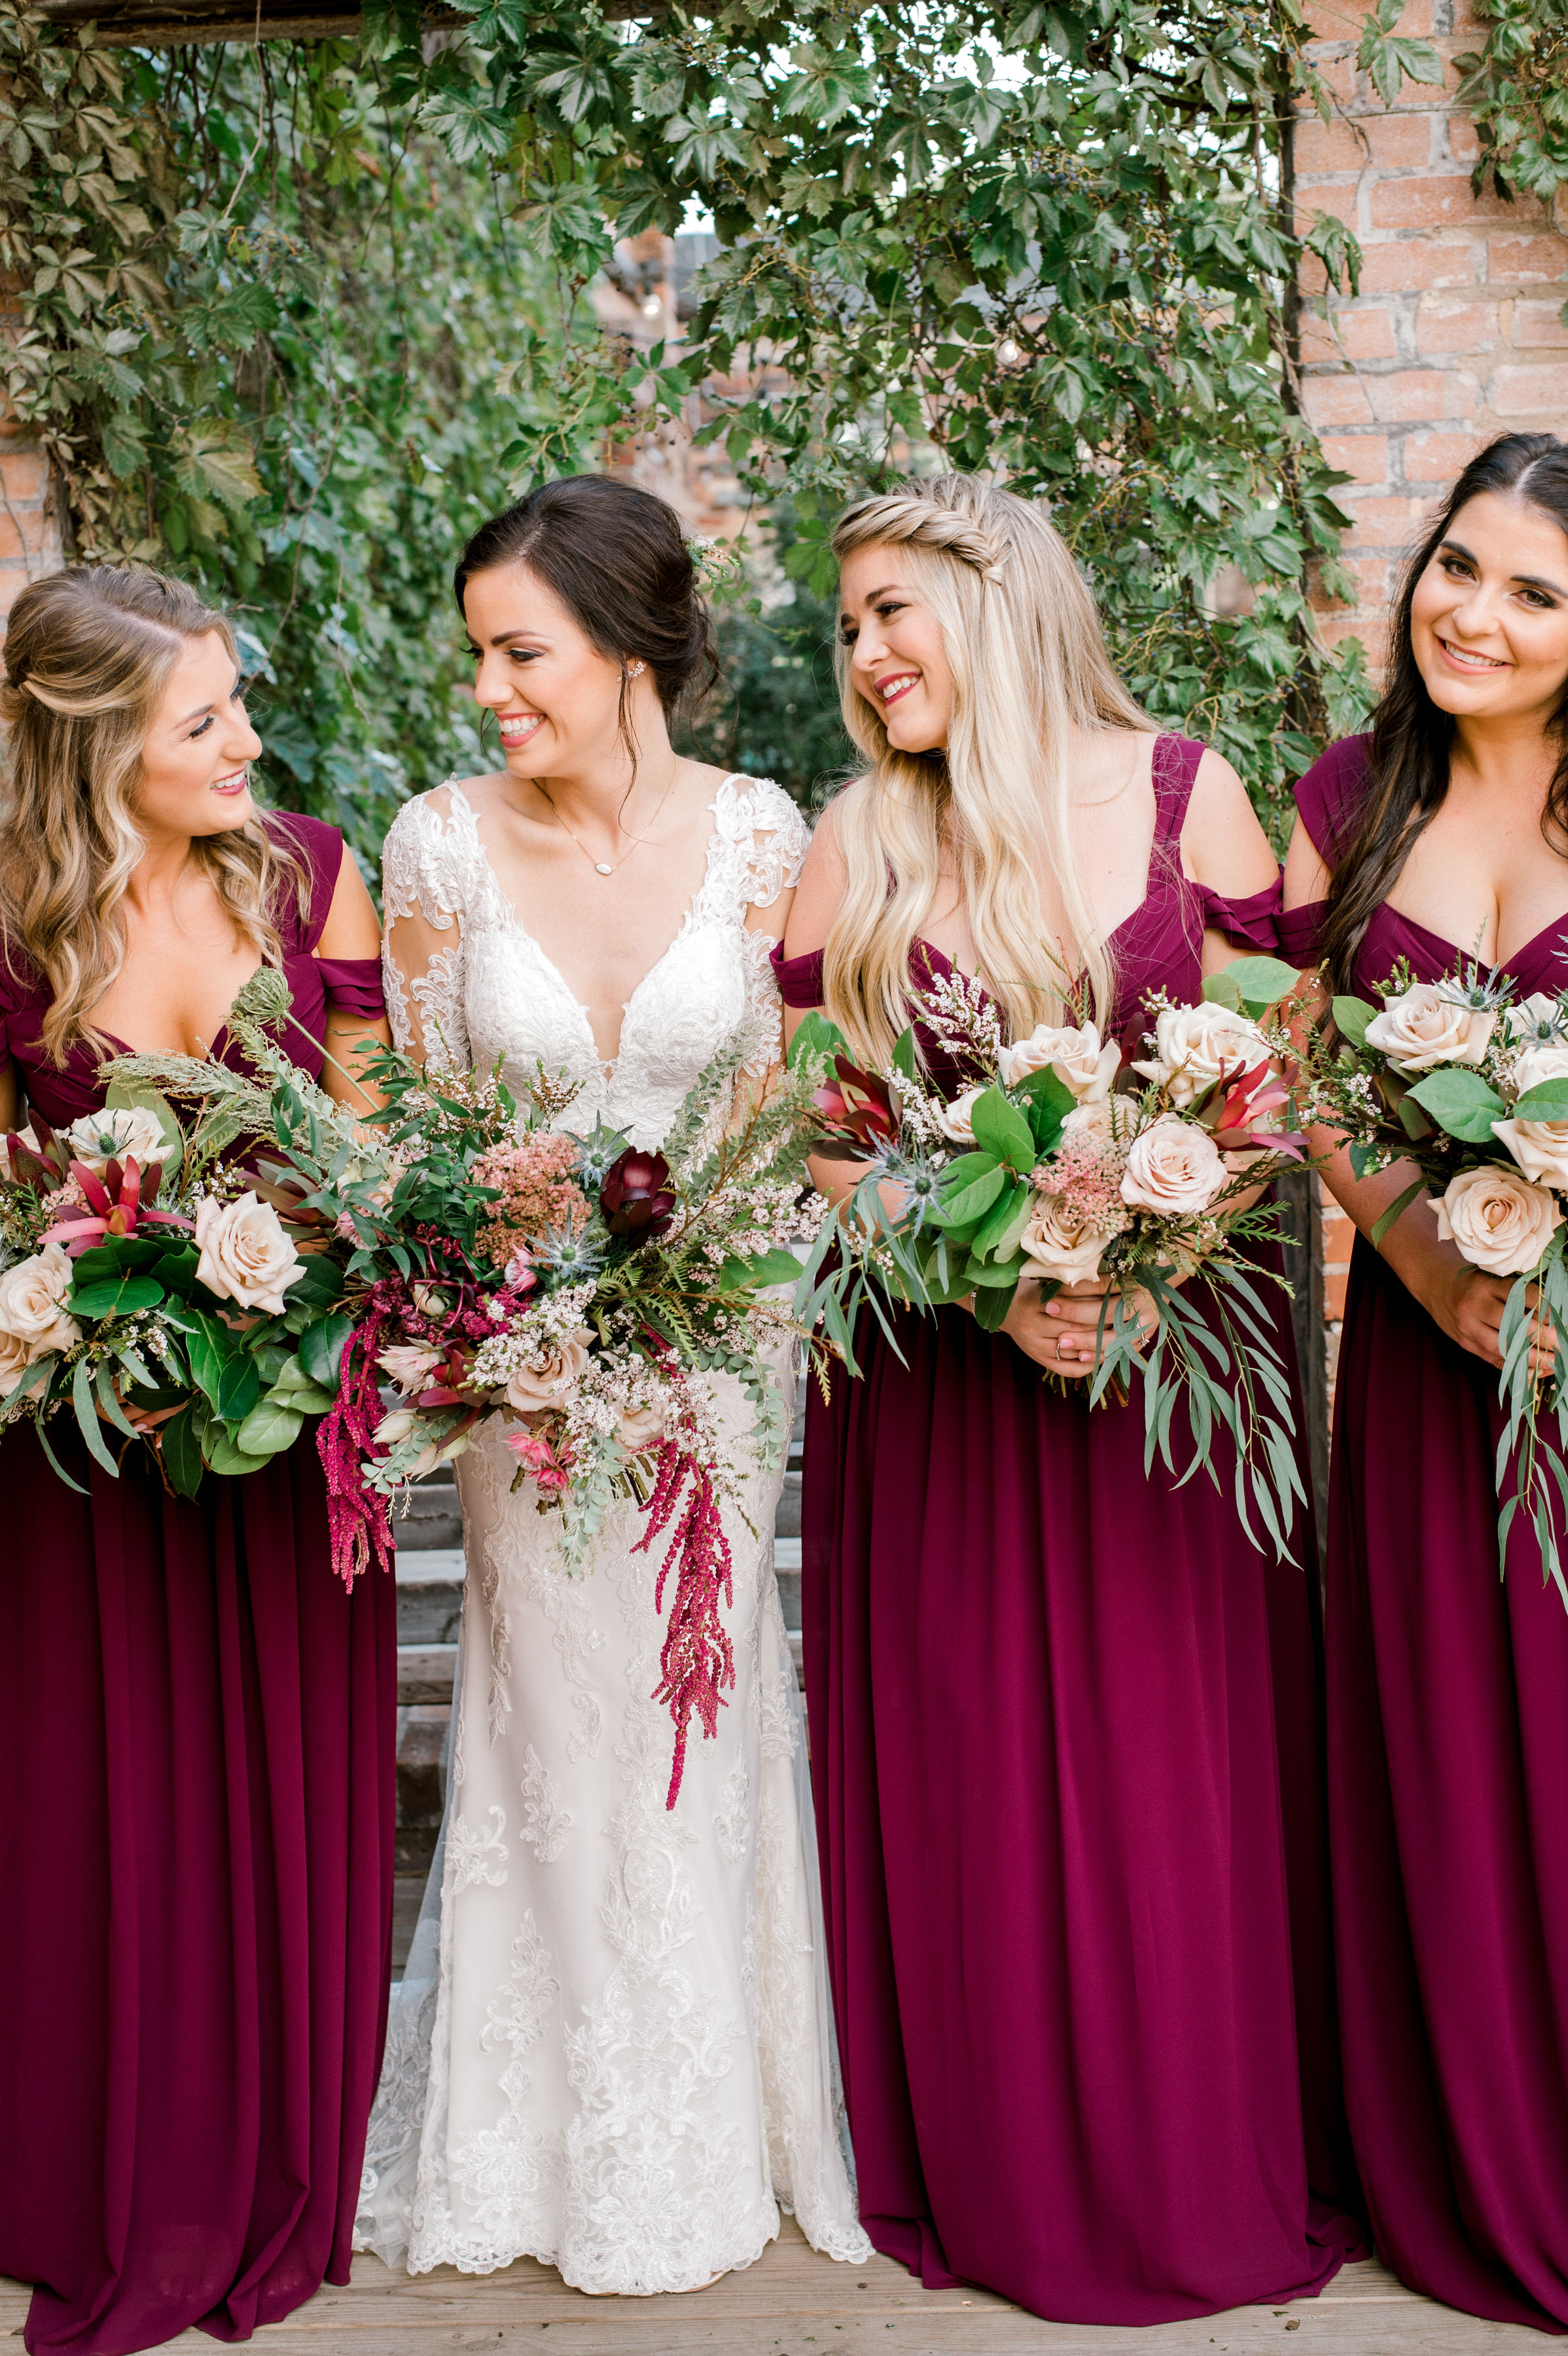 Maroon Bridesmaids Dresses | Fall Vintage Industrial Wedding in Fort Worth